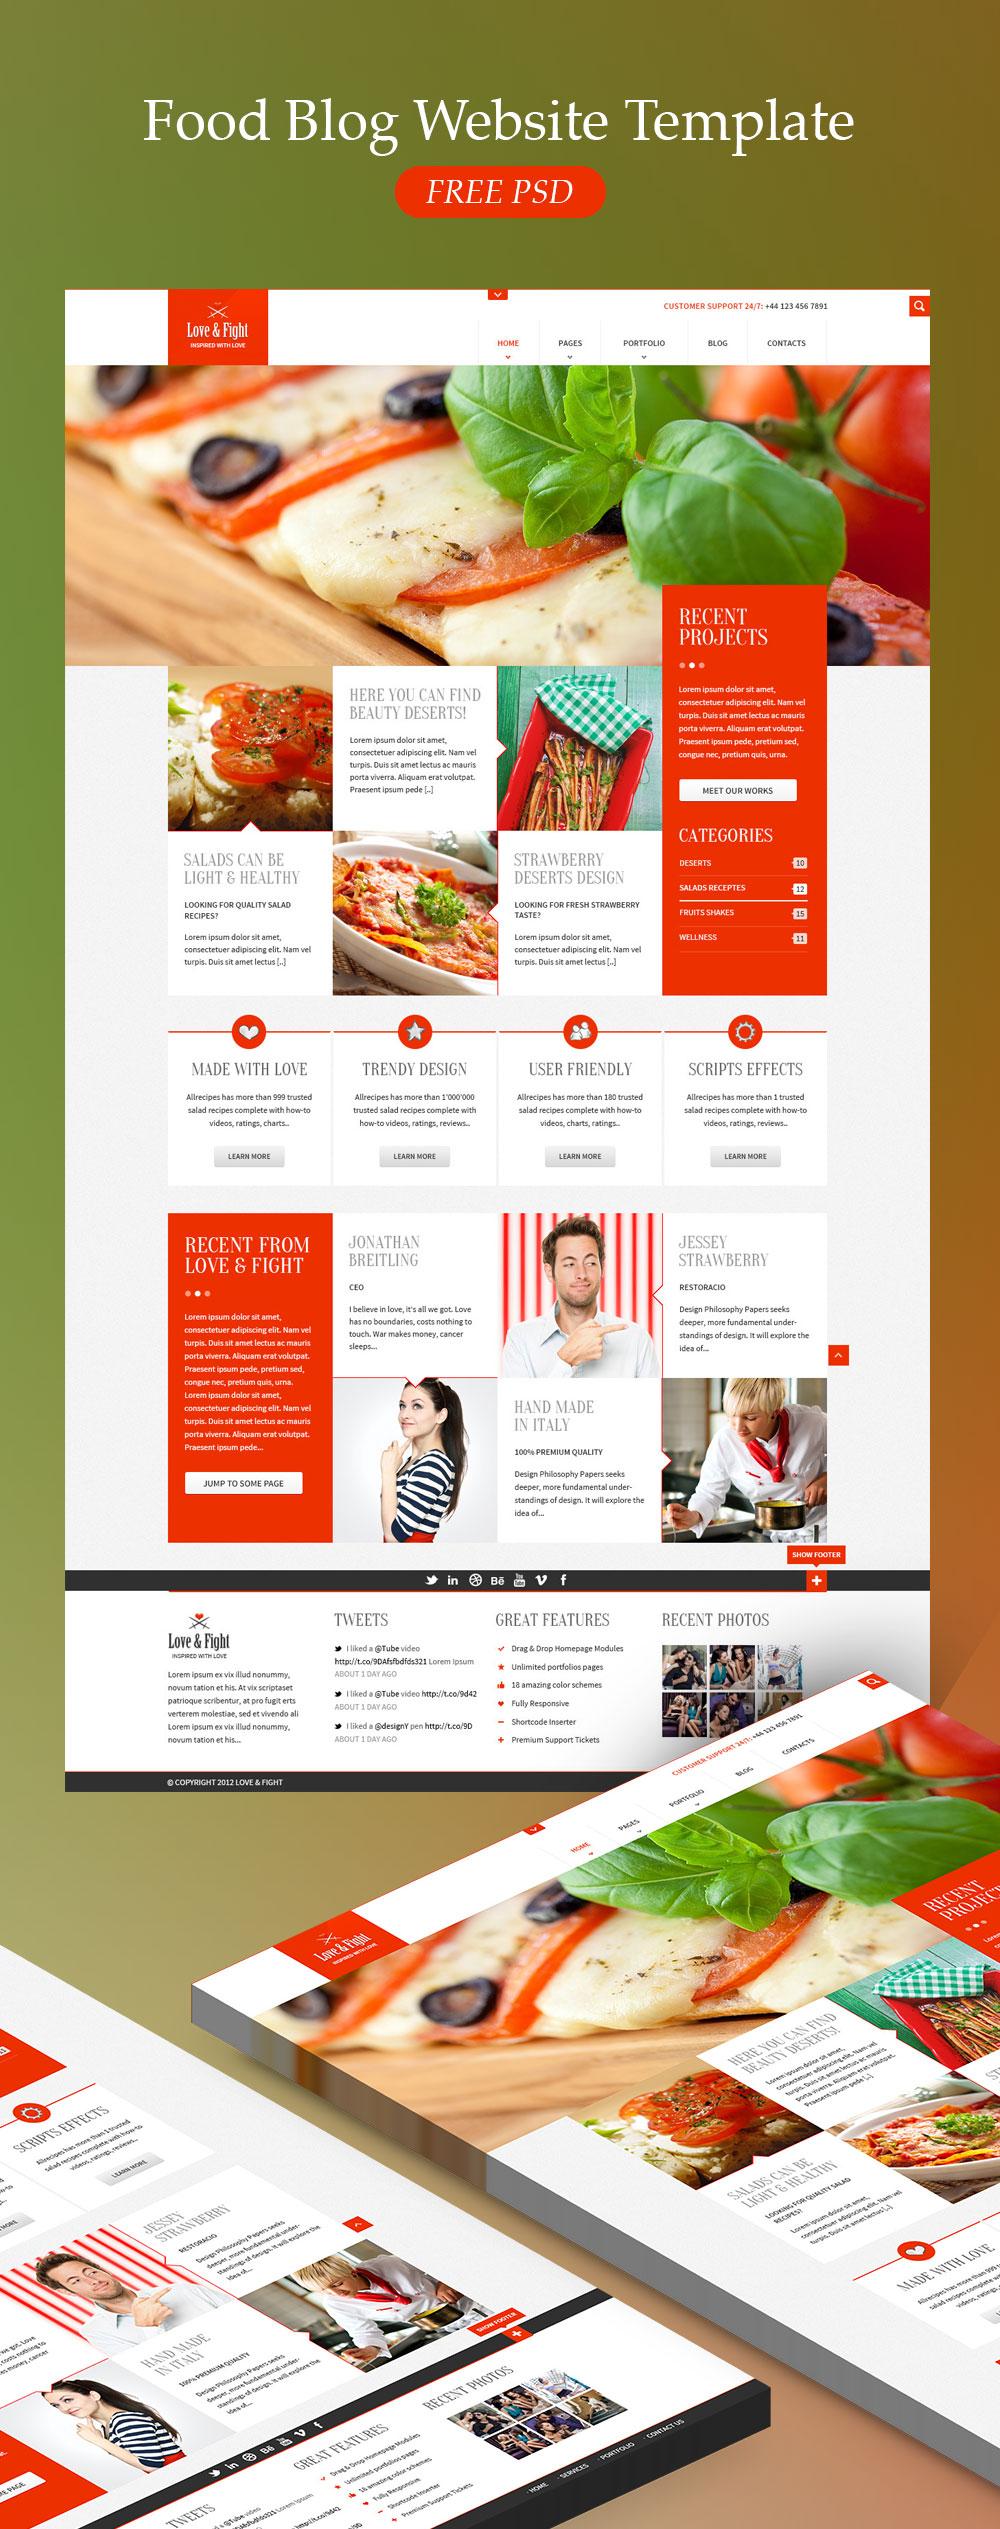 Food Blog Website Template Free PSD